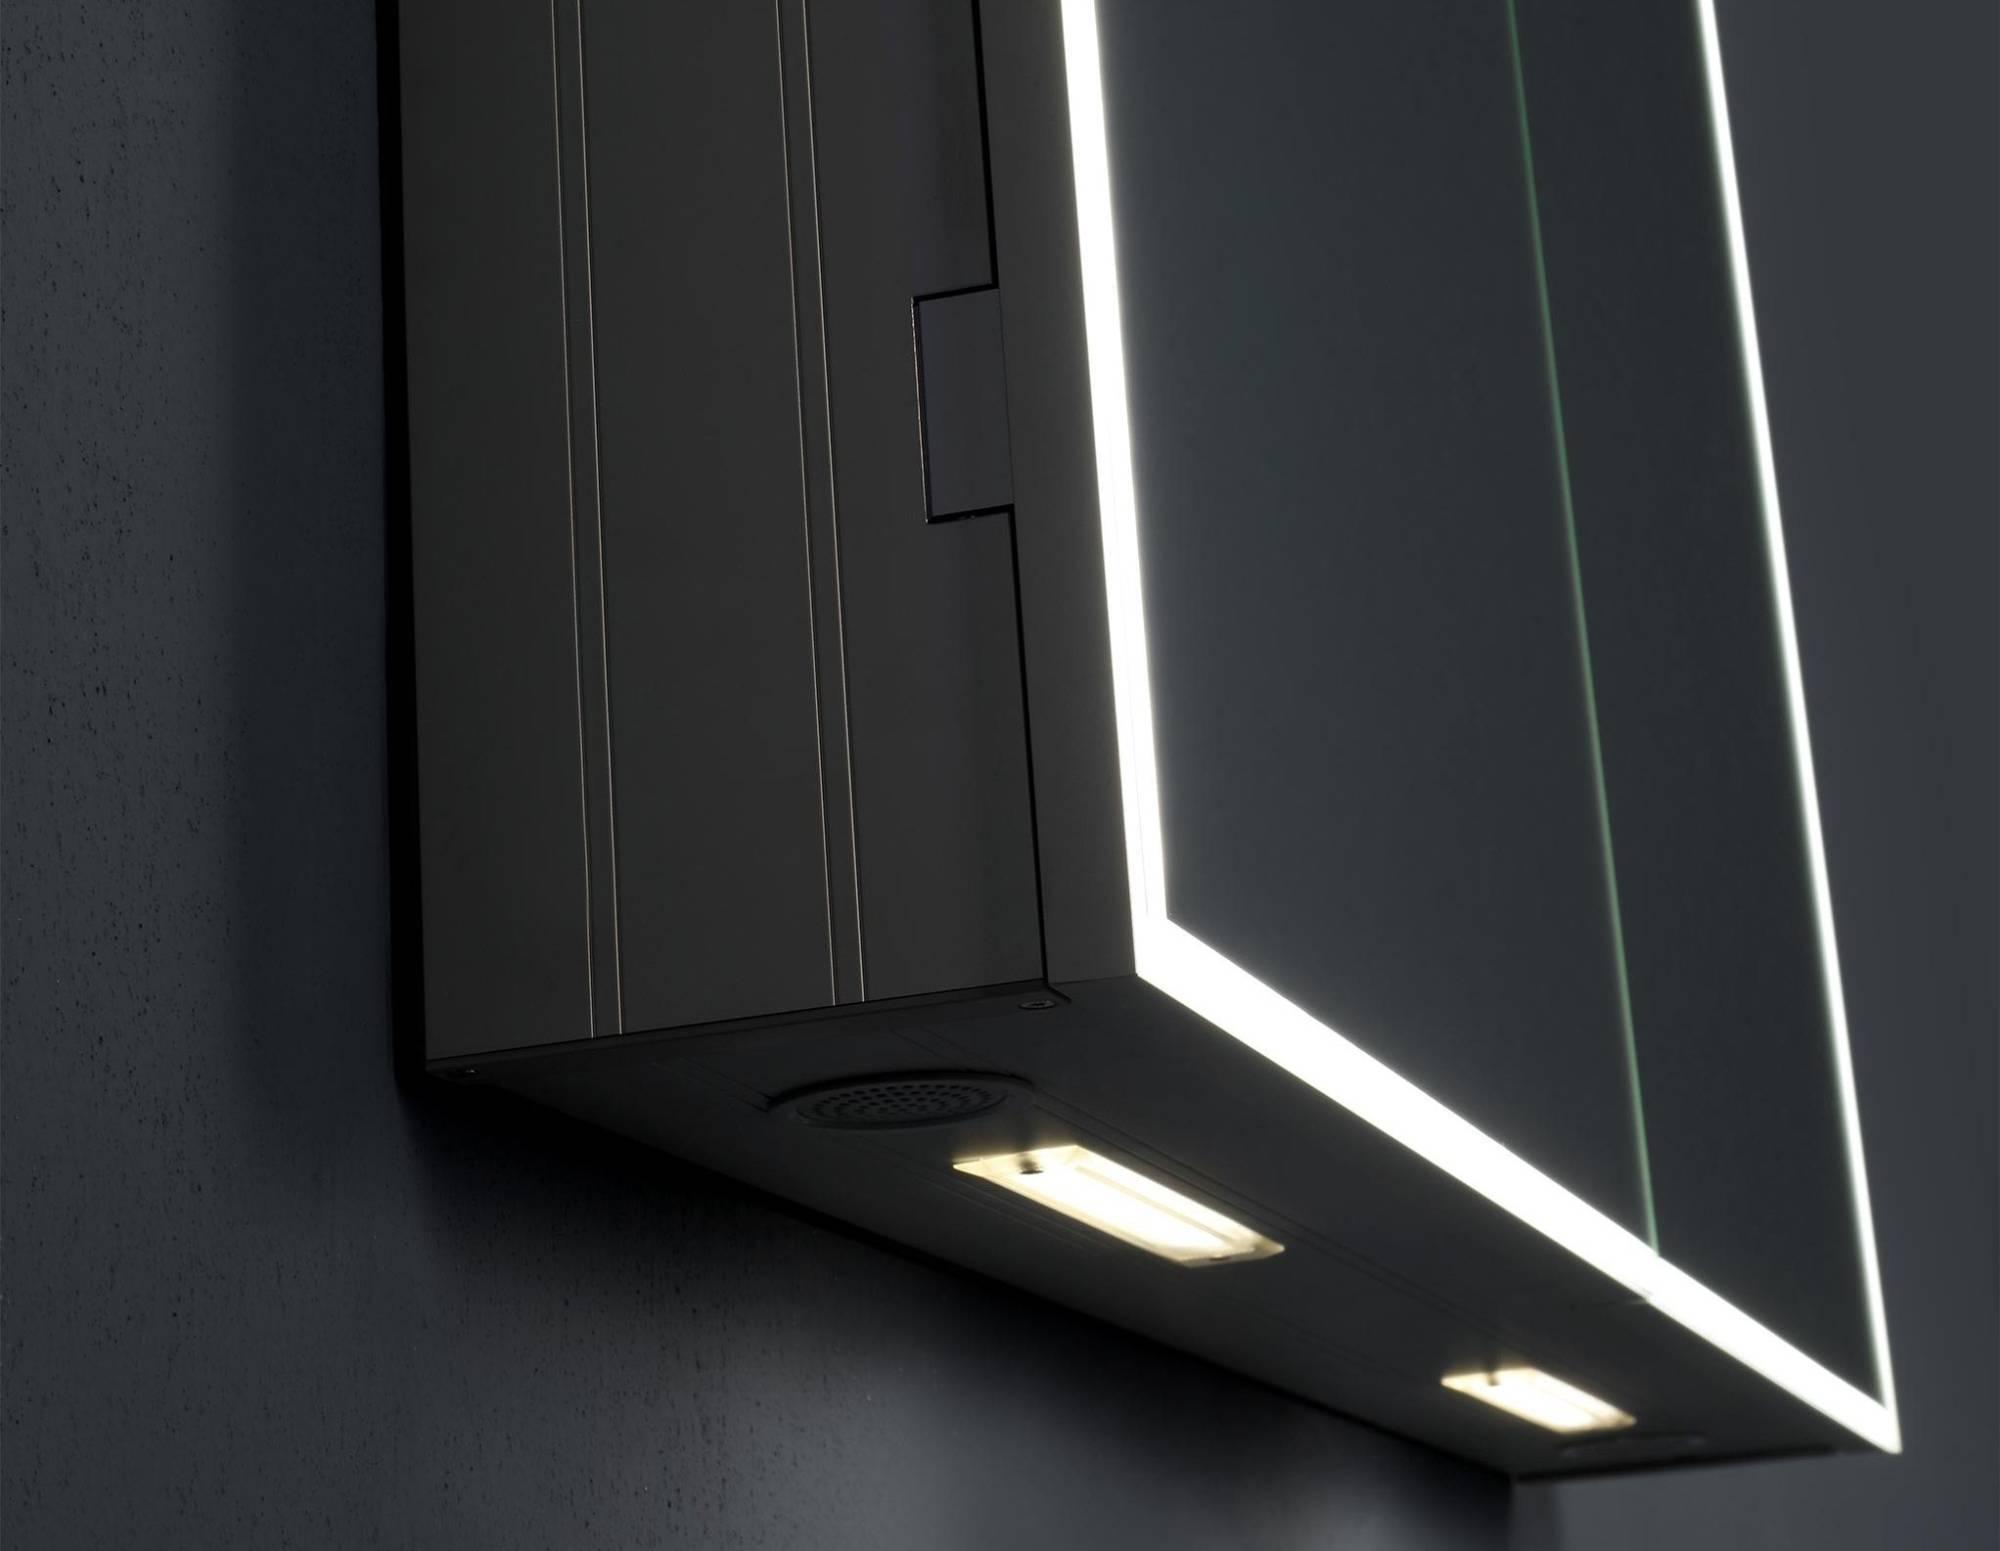 miroir_container_salle de bain_stardust_by_vanita_e_casa3_rit